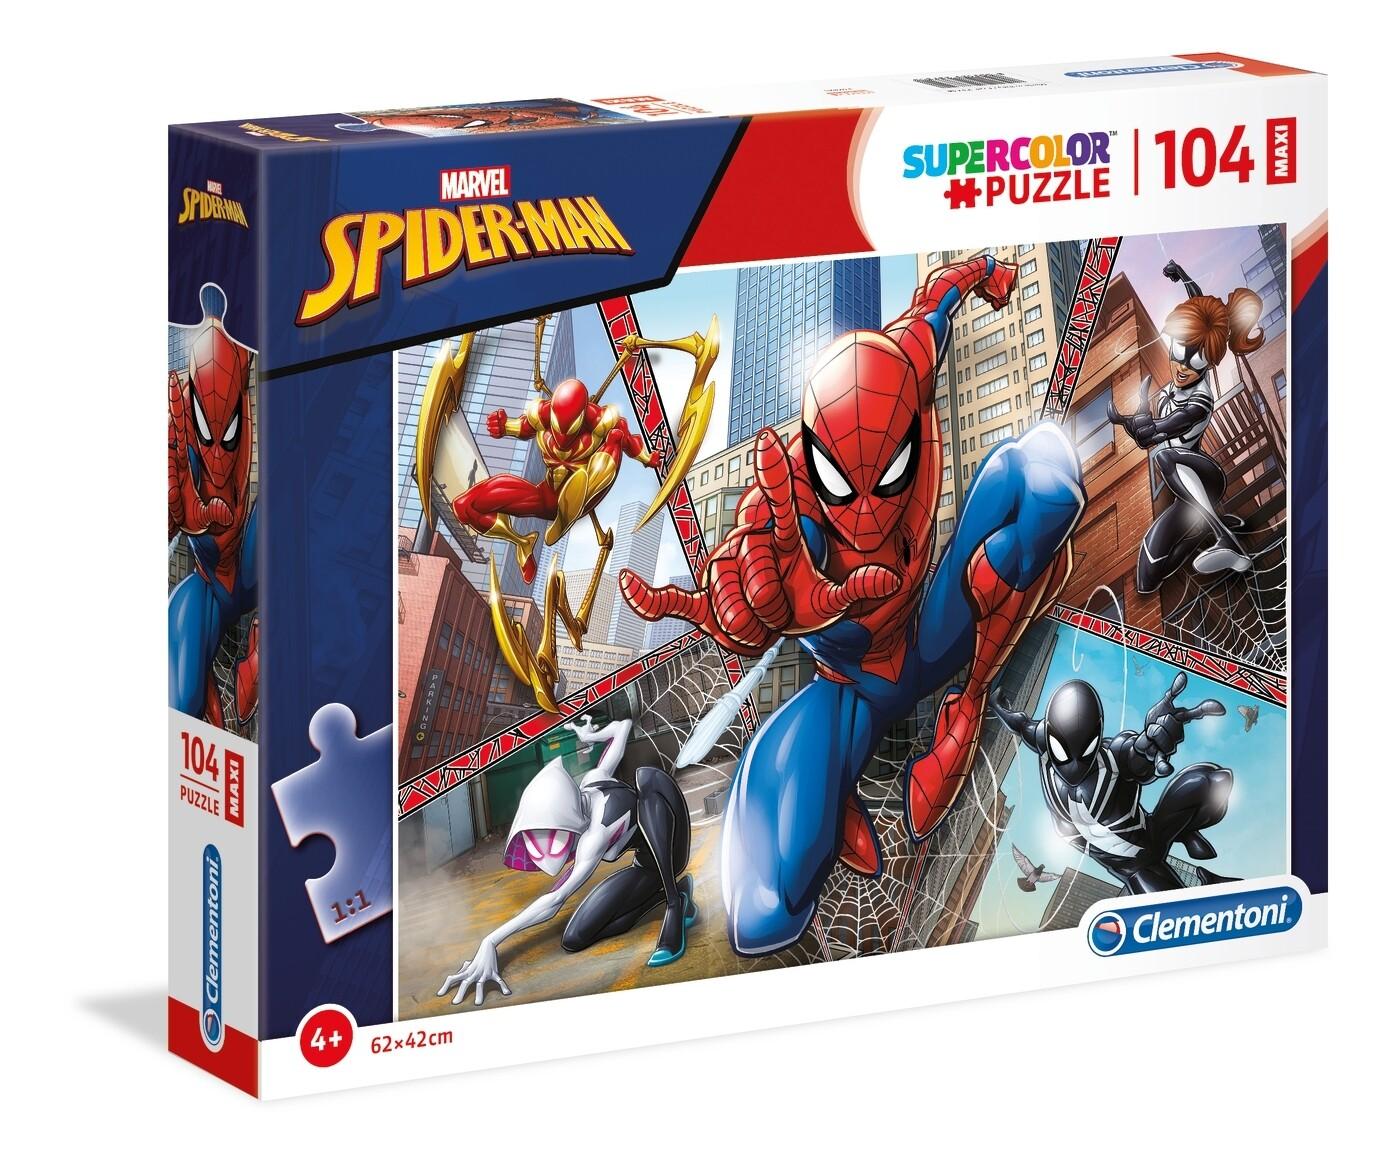 PUZZLE Supercolor MAXI - 104pcs - Spiderman - CLEMENTONI